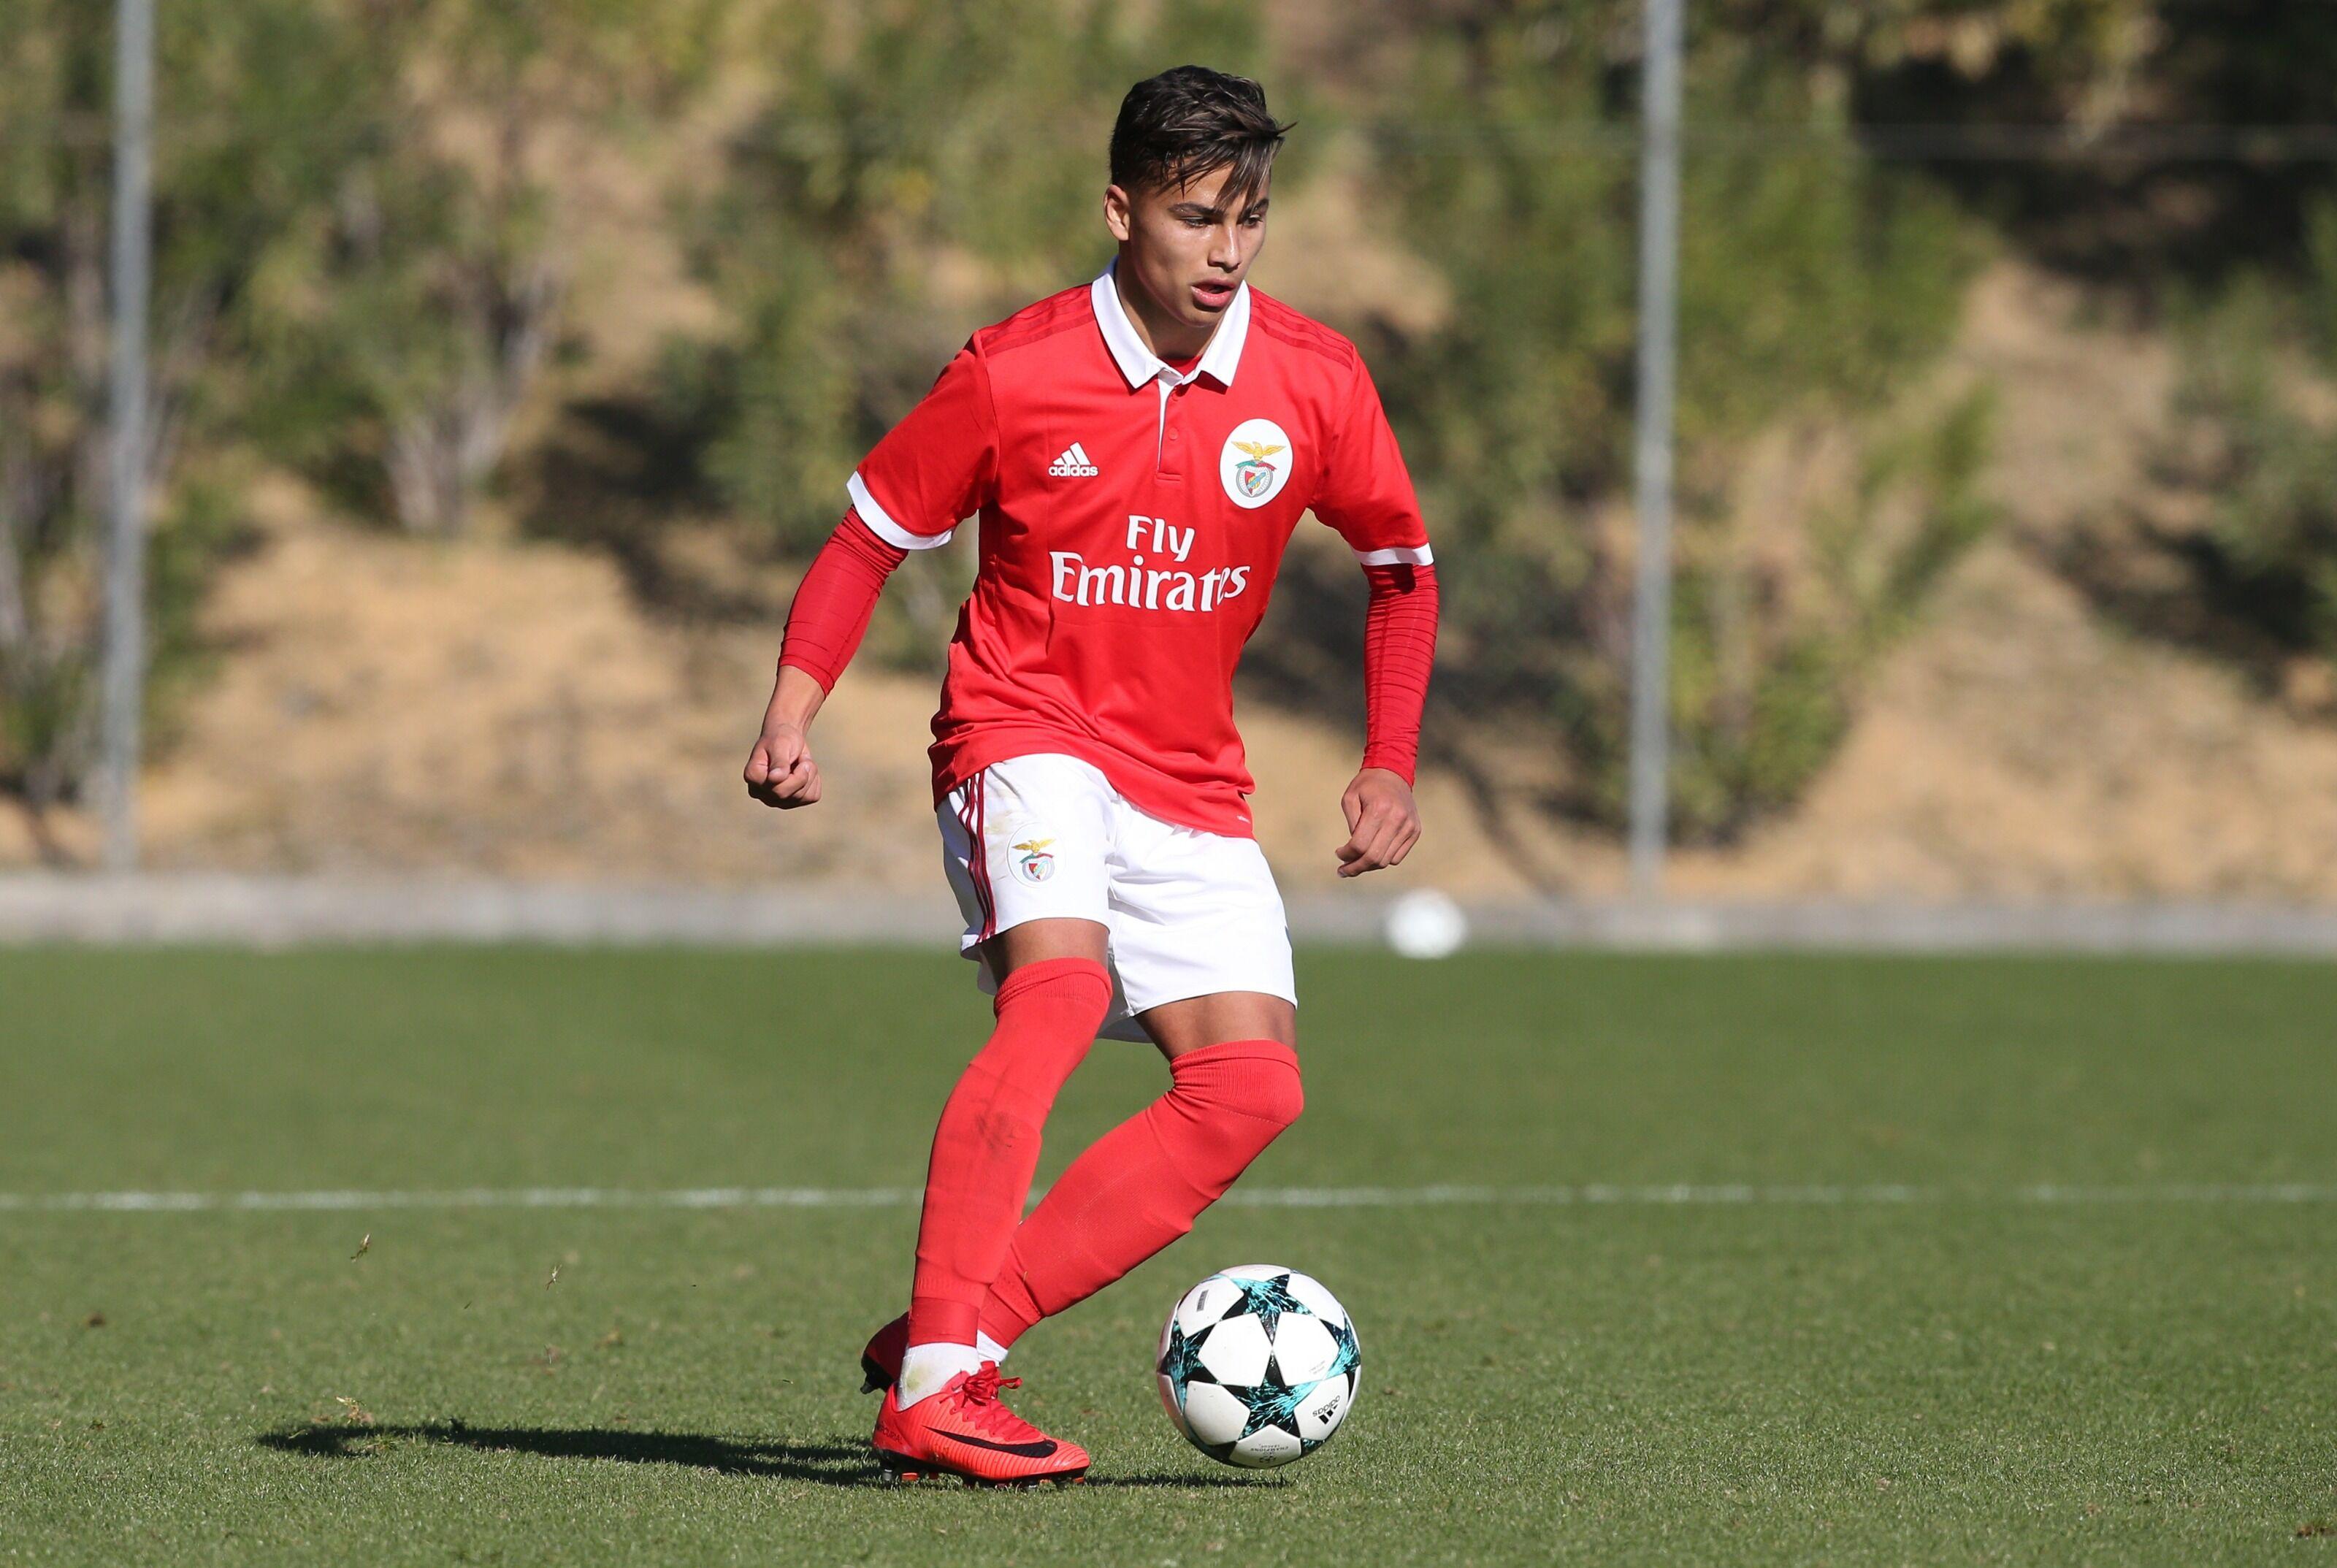 Morelia inks Medina, former Real Madrid academy player